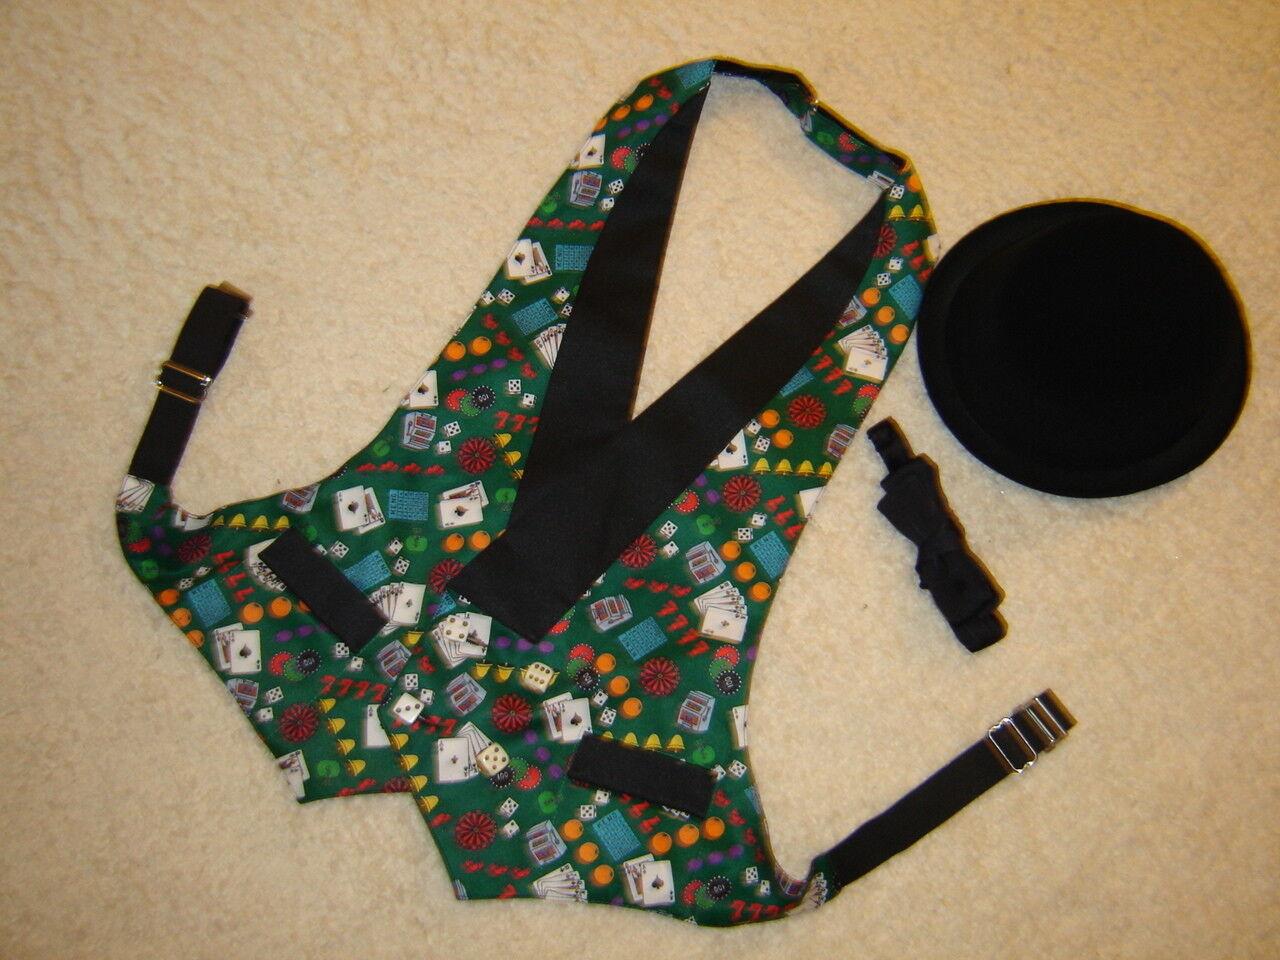 Gambler theme steampunk 1 2 vest print satin lined adjustable S M  derby